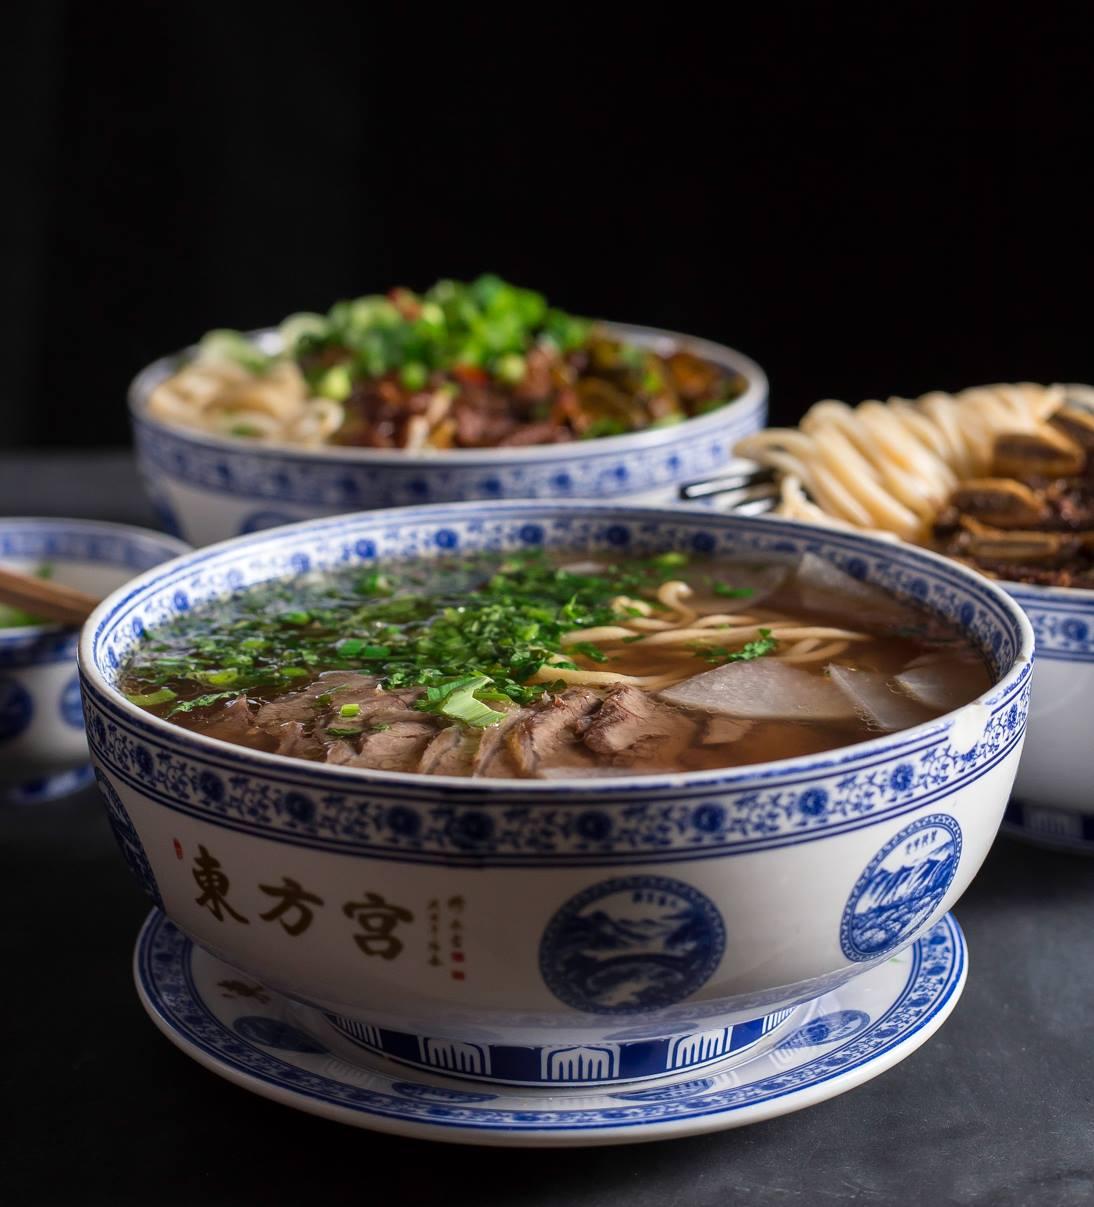 Omni palace noodles